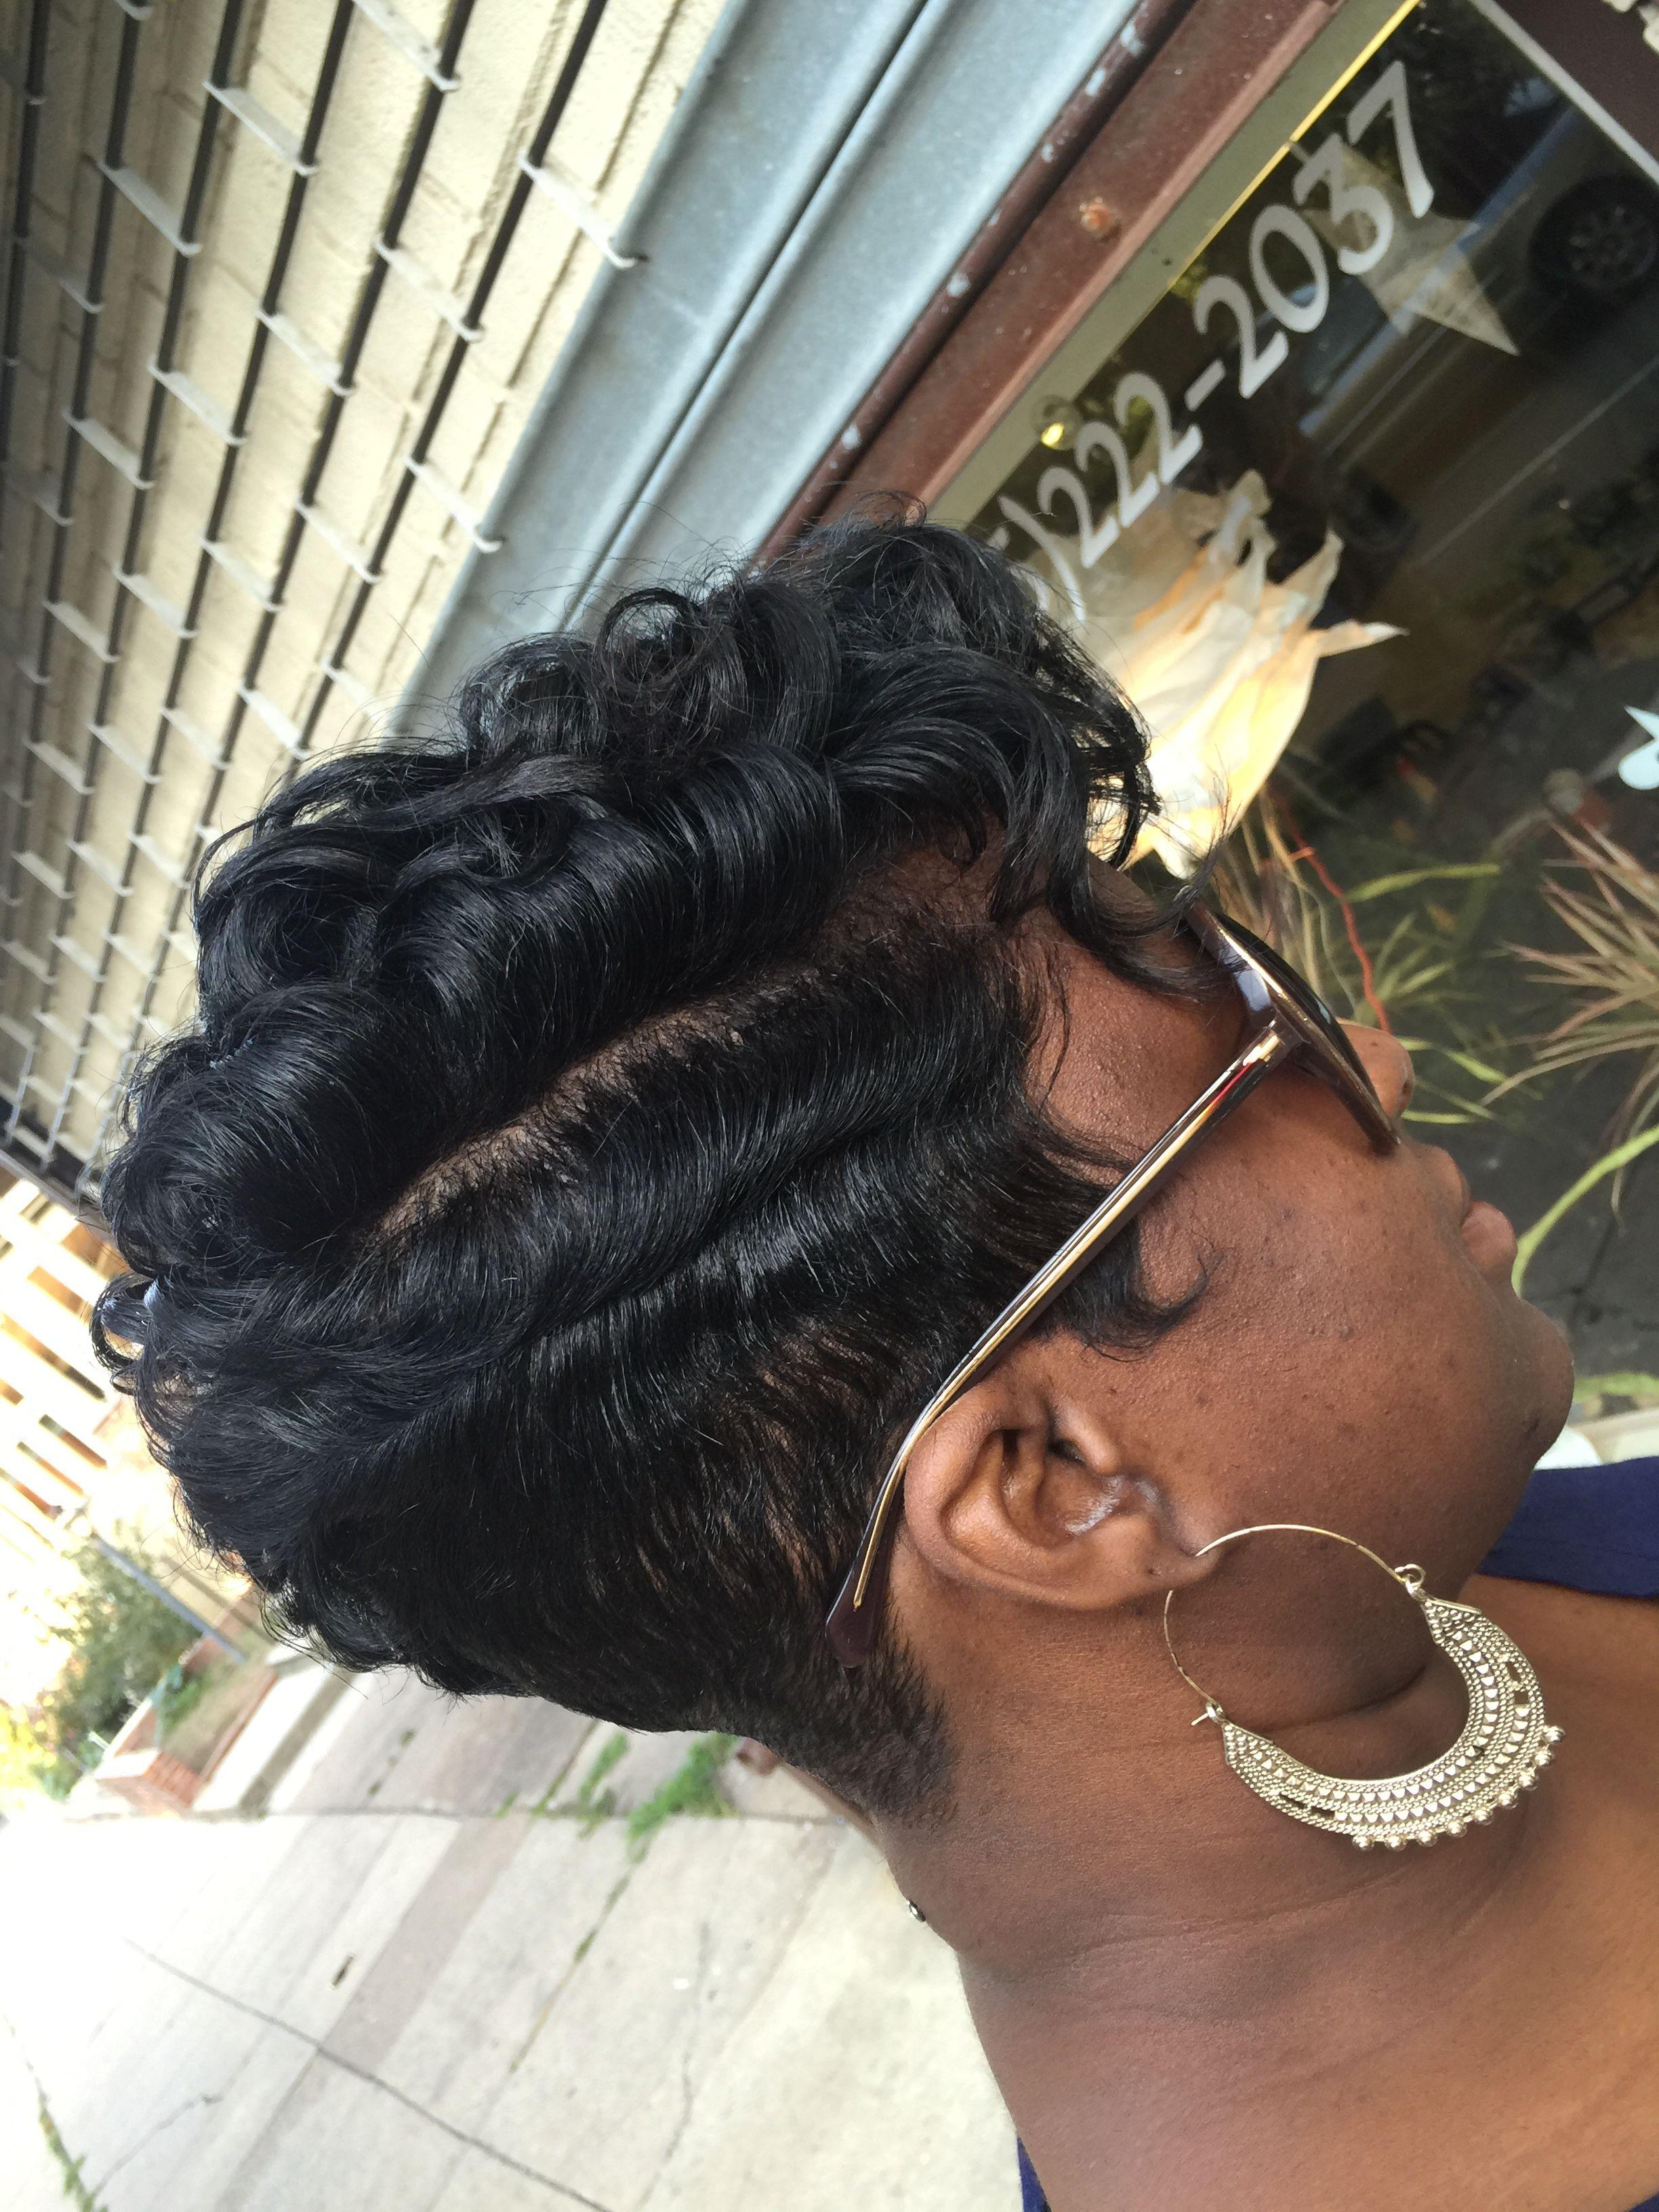 Relaxer Free Hair Stylist Marketia Le Loft Llc Hair Salon Philadelphia Pa Relaxed Hair Natural Hair Styles Short Hair Styles